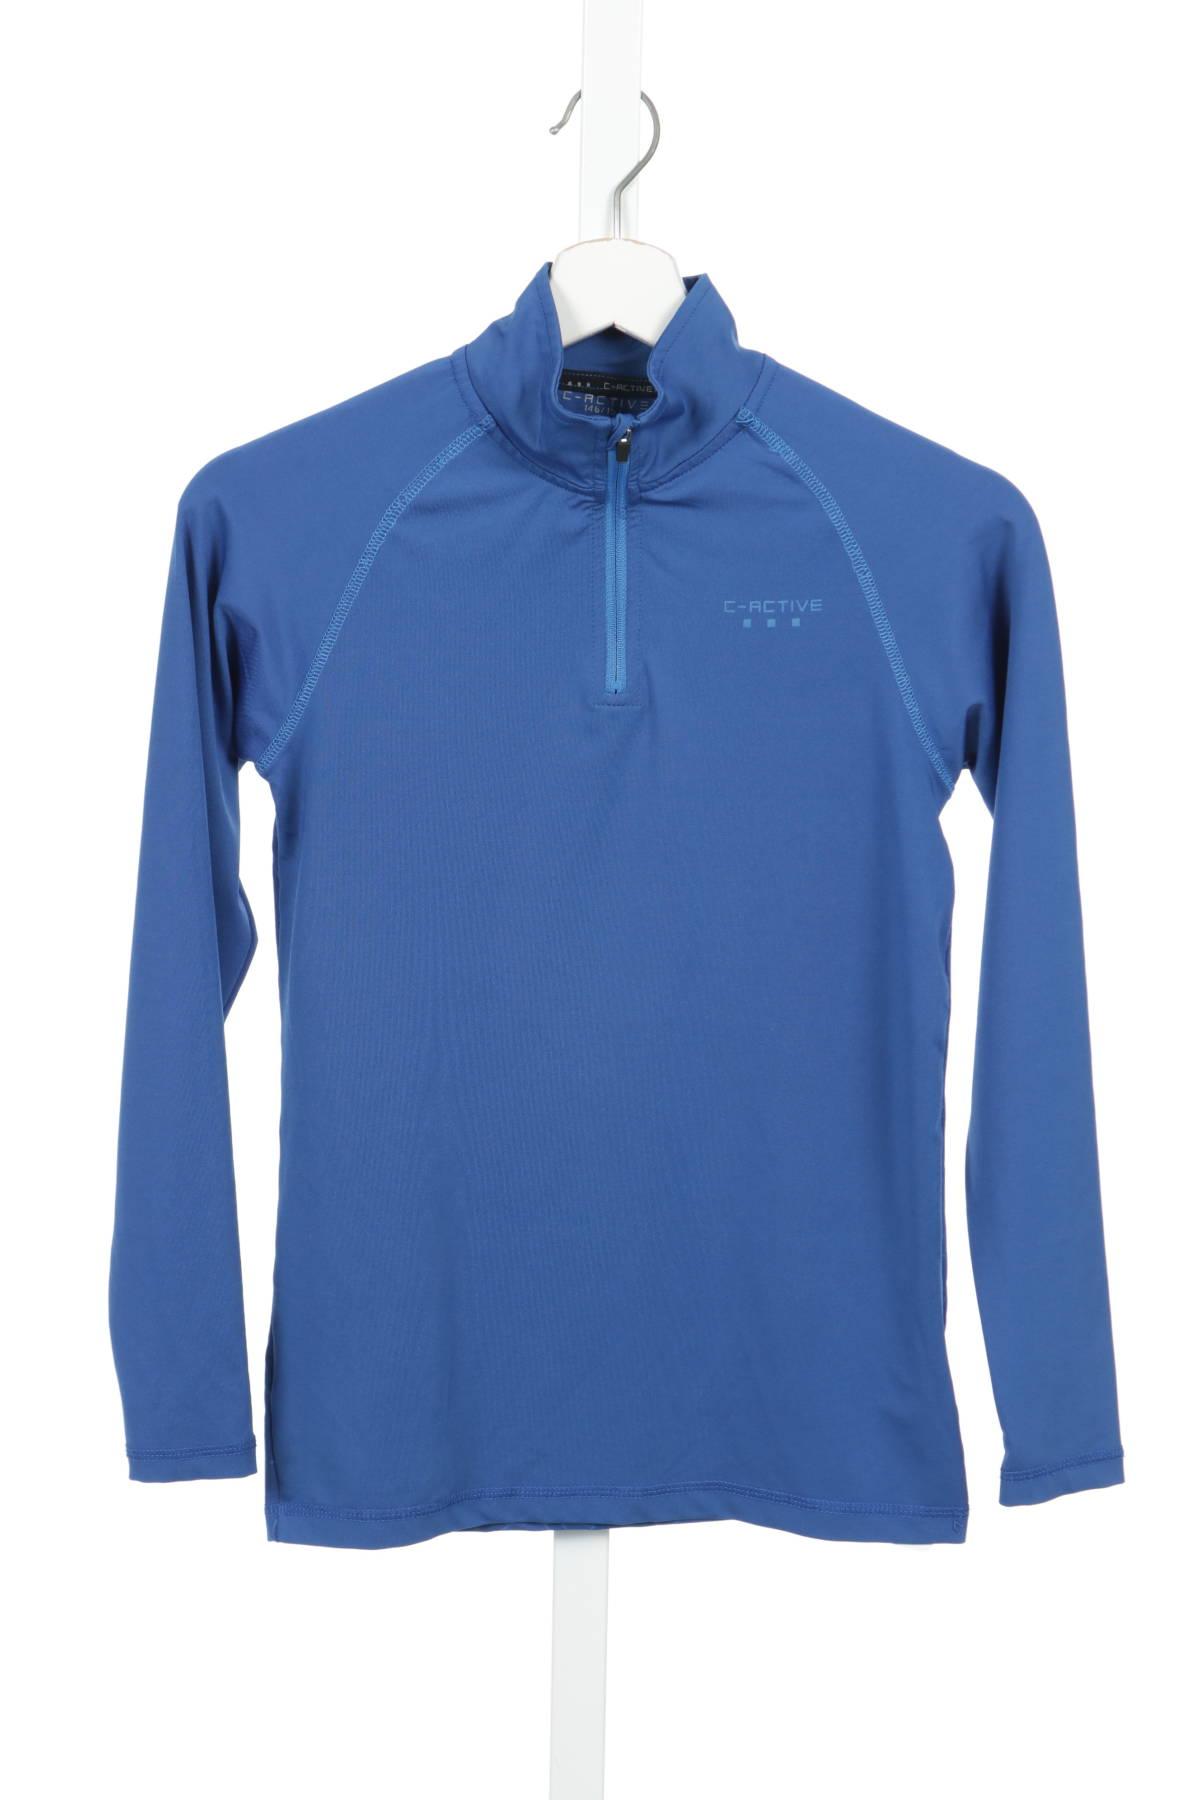 Детска спортна блуза C-active1